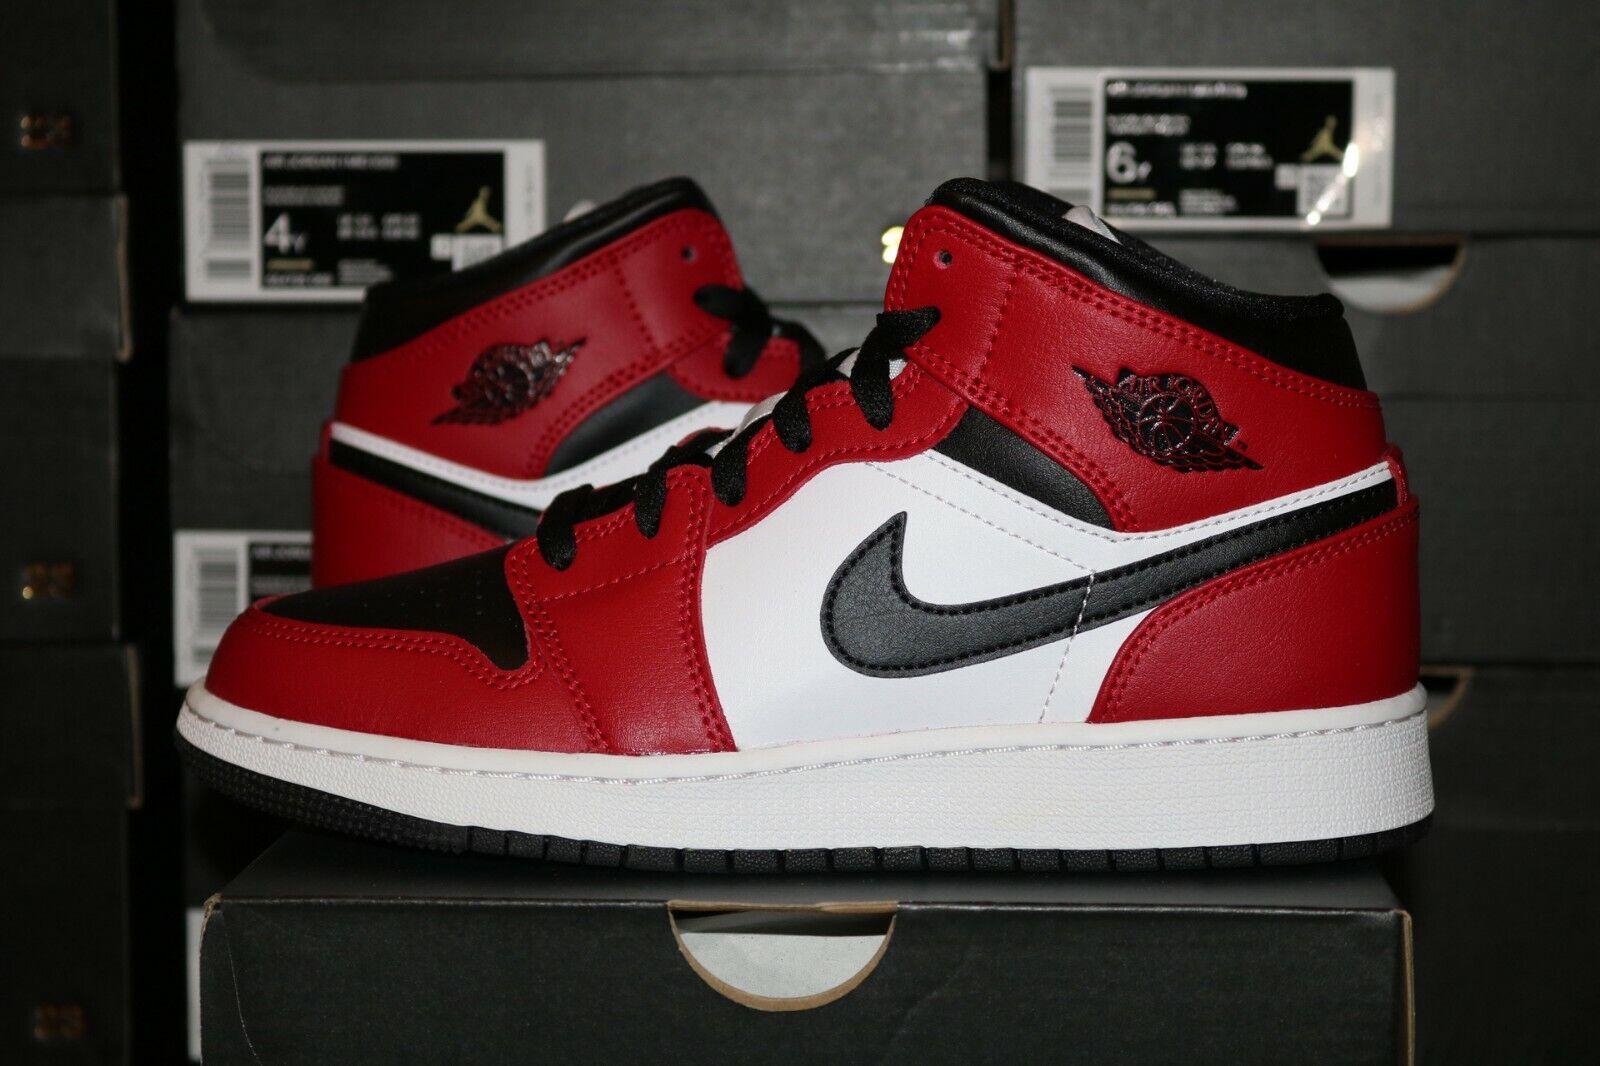 Nike Air Jordan 1 Retro Low OG AJ1 Black Toe Red GS Youth UK 5 6 7 US Y New